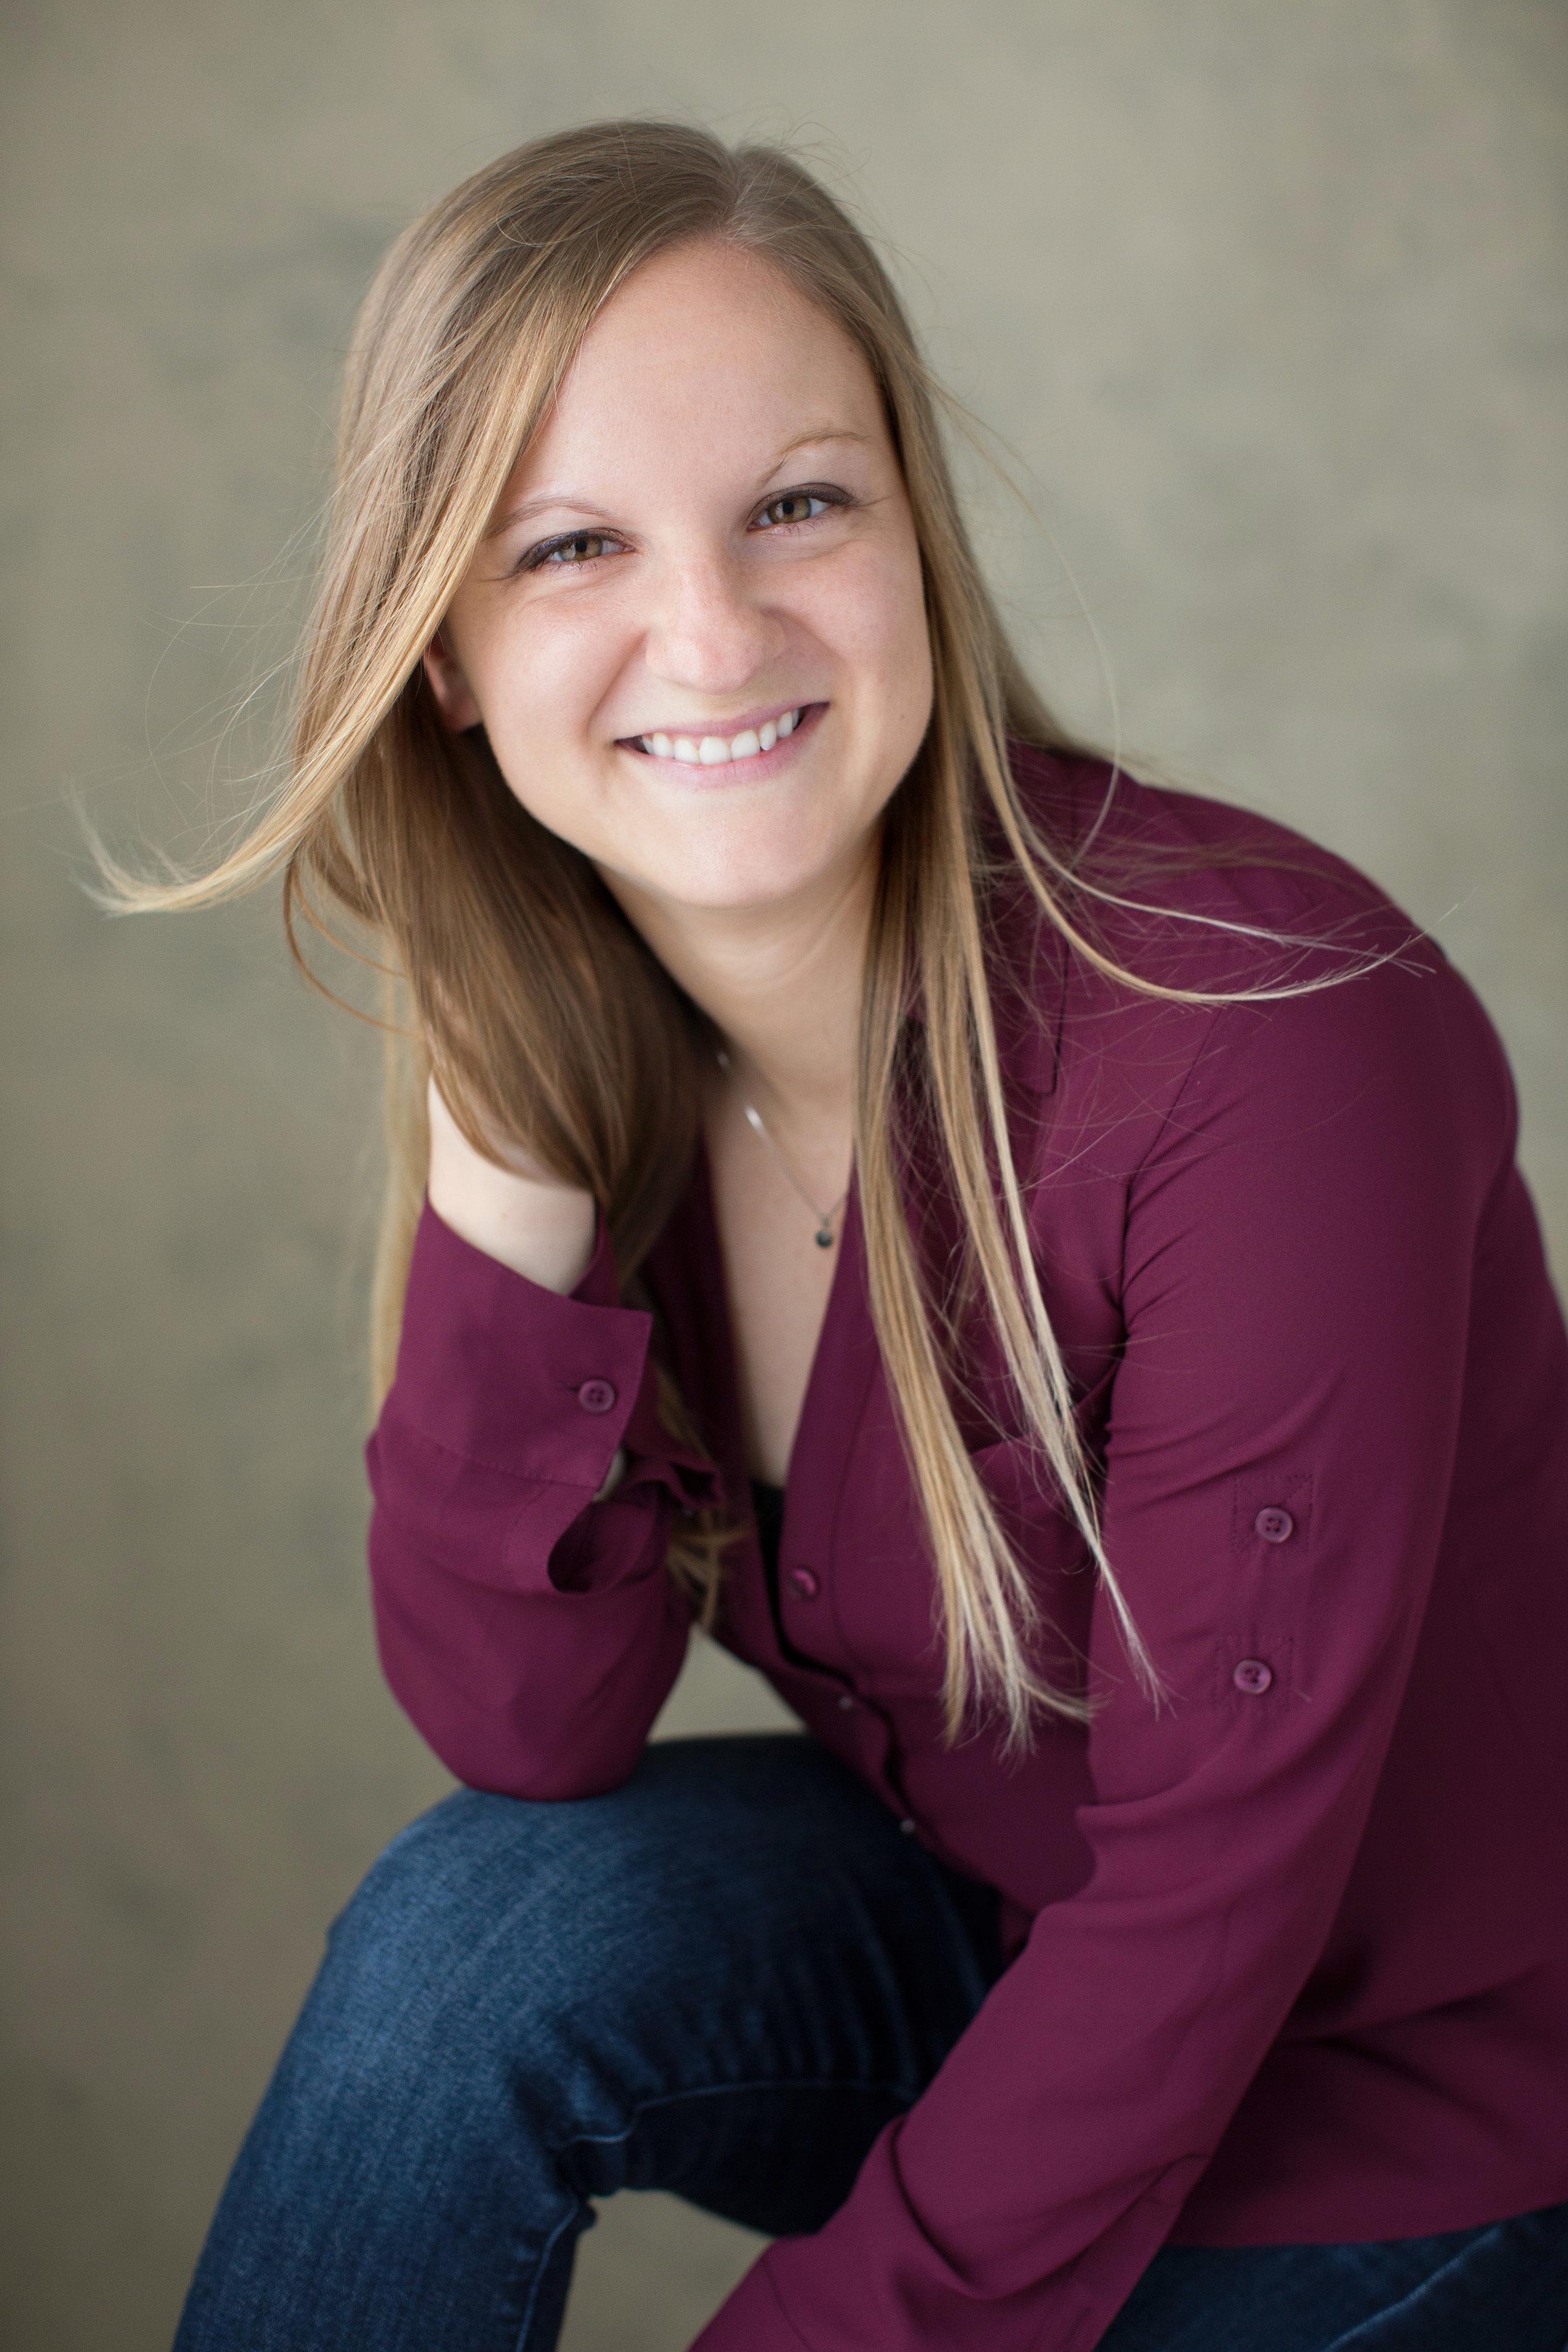 Whitney Hochstetler, MS, RD, LDN